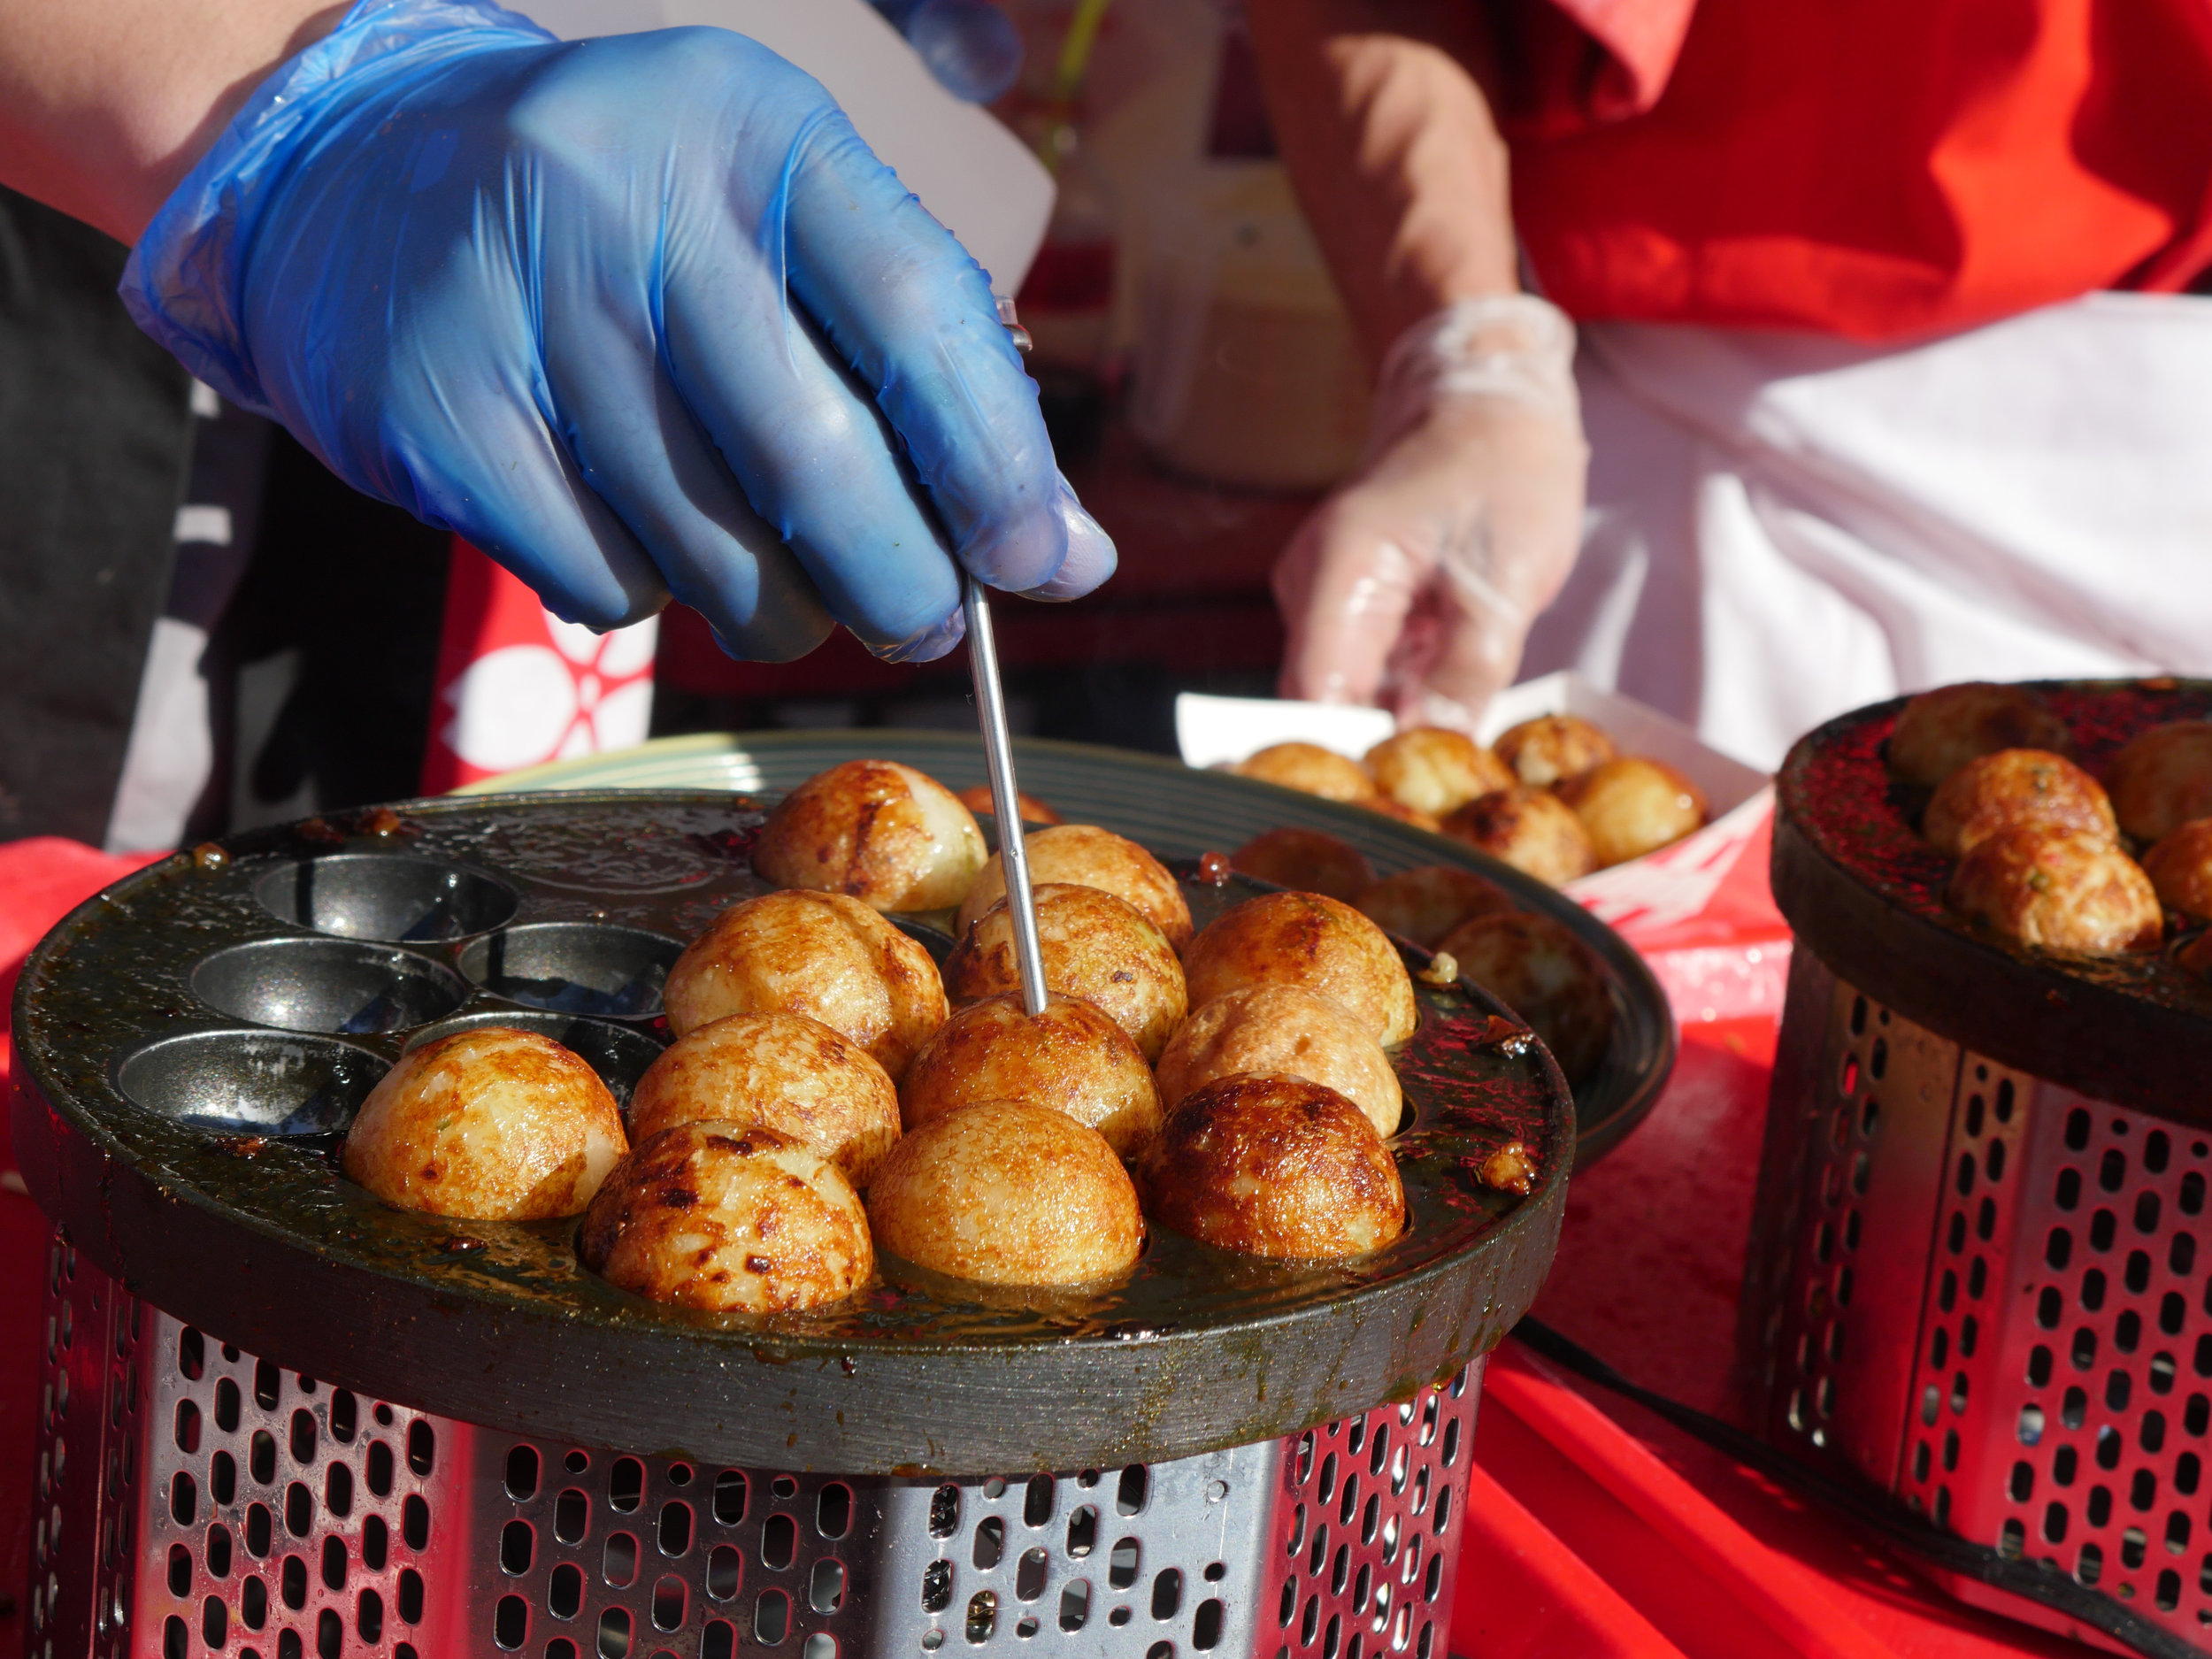 Takiyoki balls cook on a hot plate during the 34th Arizona Matsuri Festival of Japan in Phoenix, Ariz. on Feb. 24, 2018.  (Nick Serpa/azcentral)